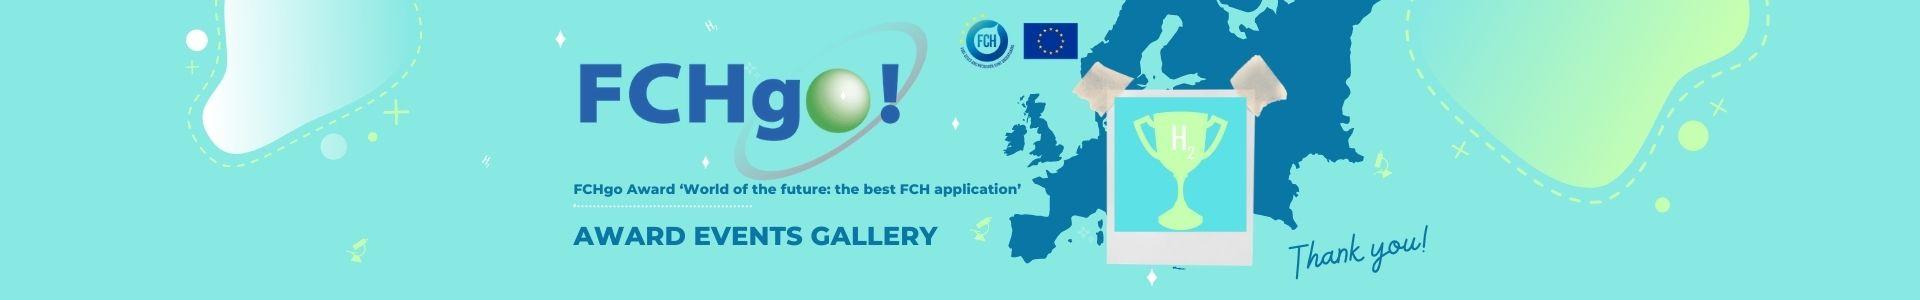 banner-fchgo-award-gallery-300px